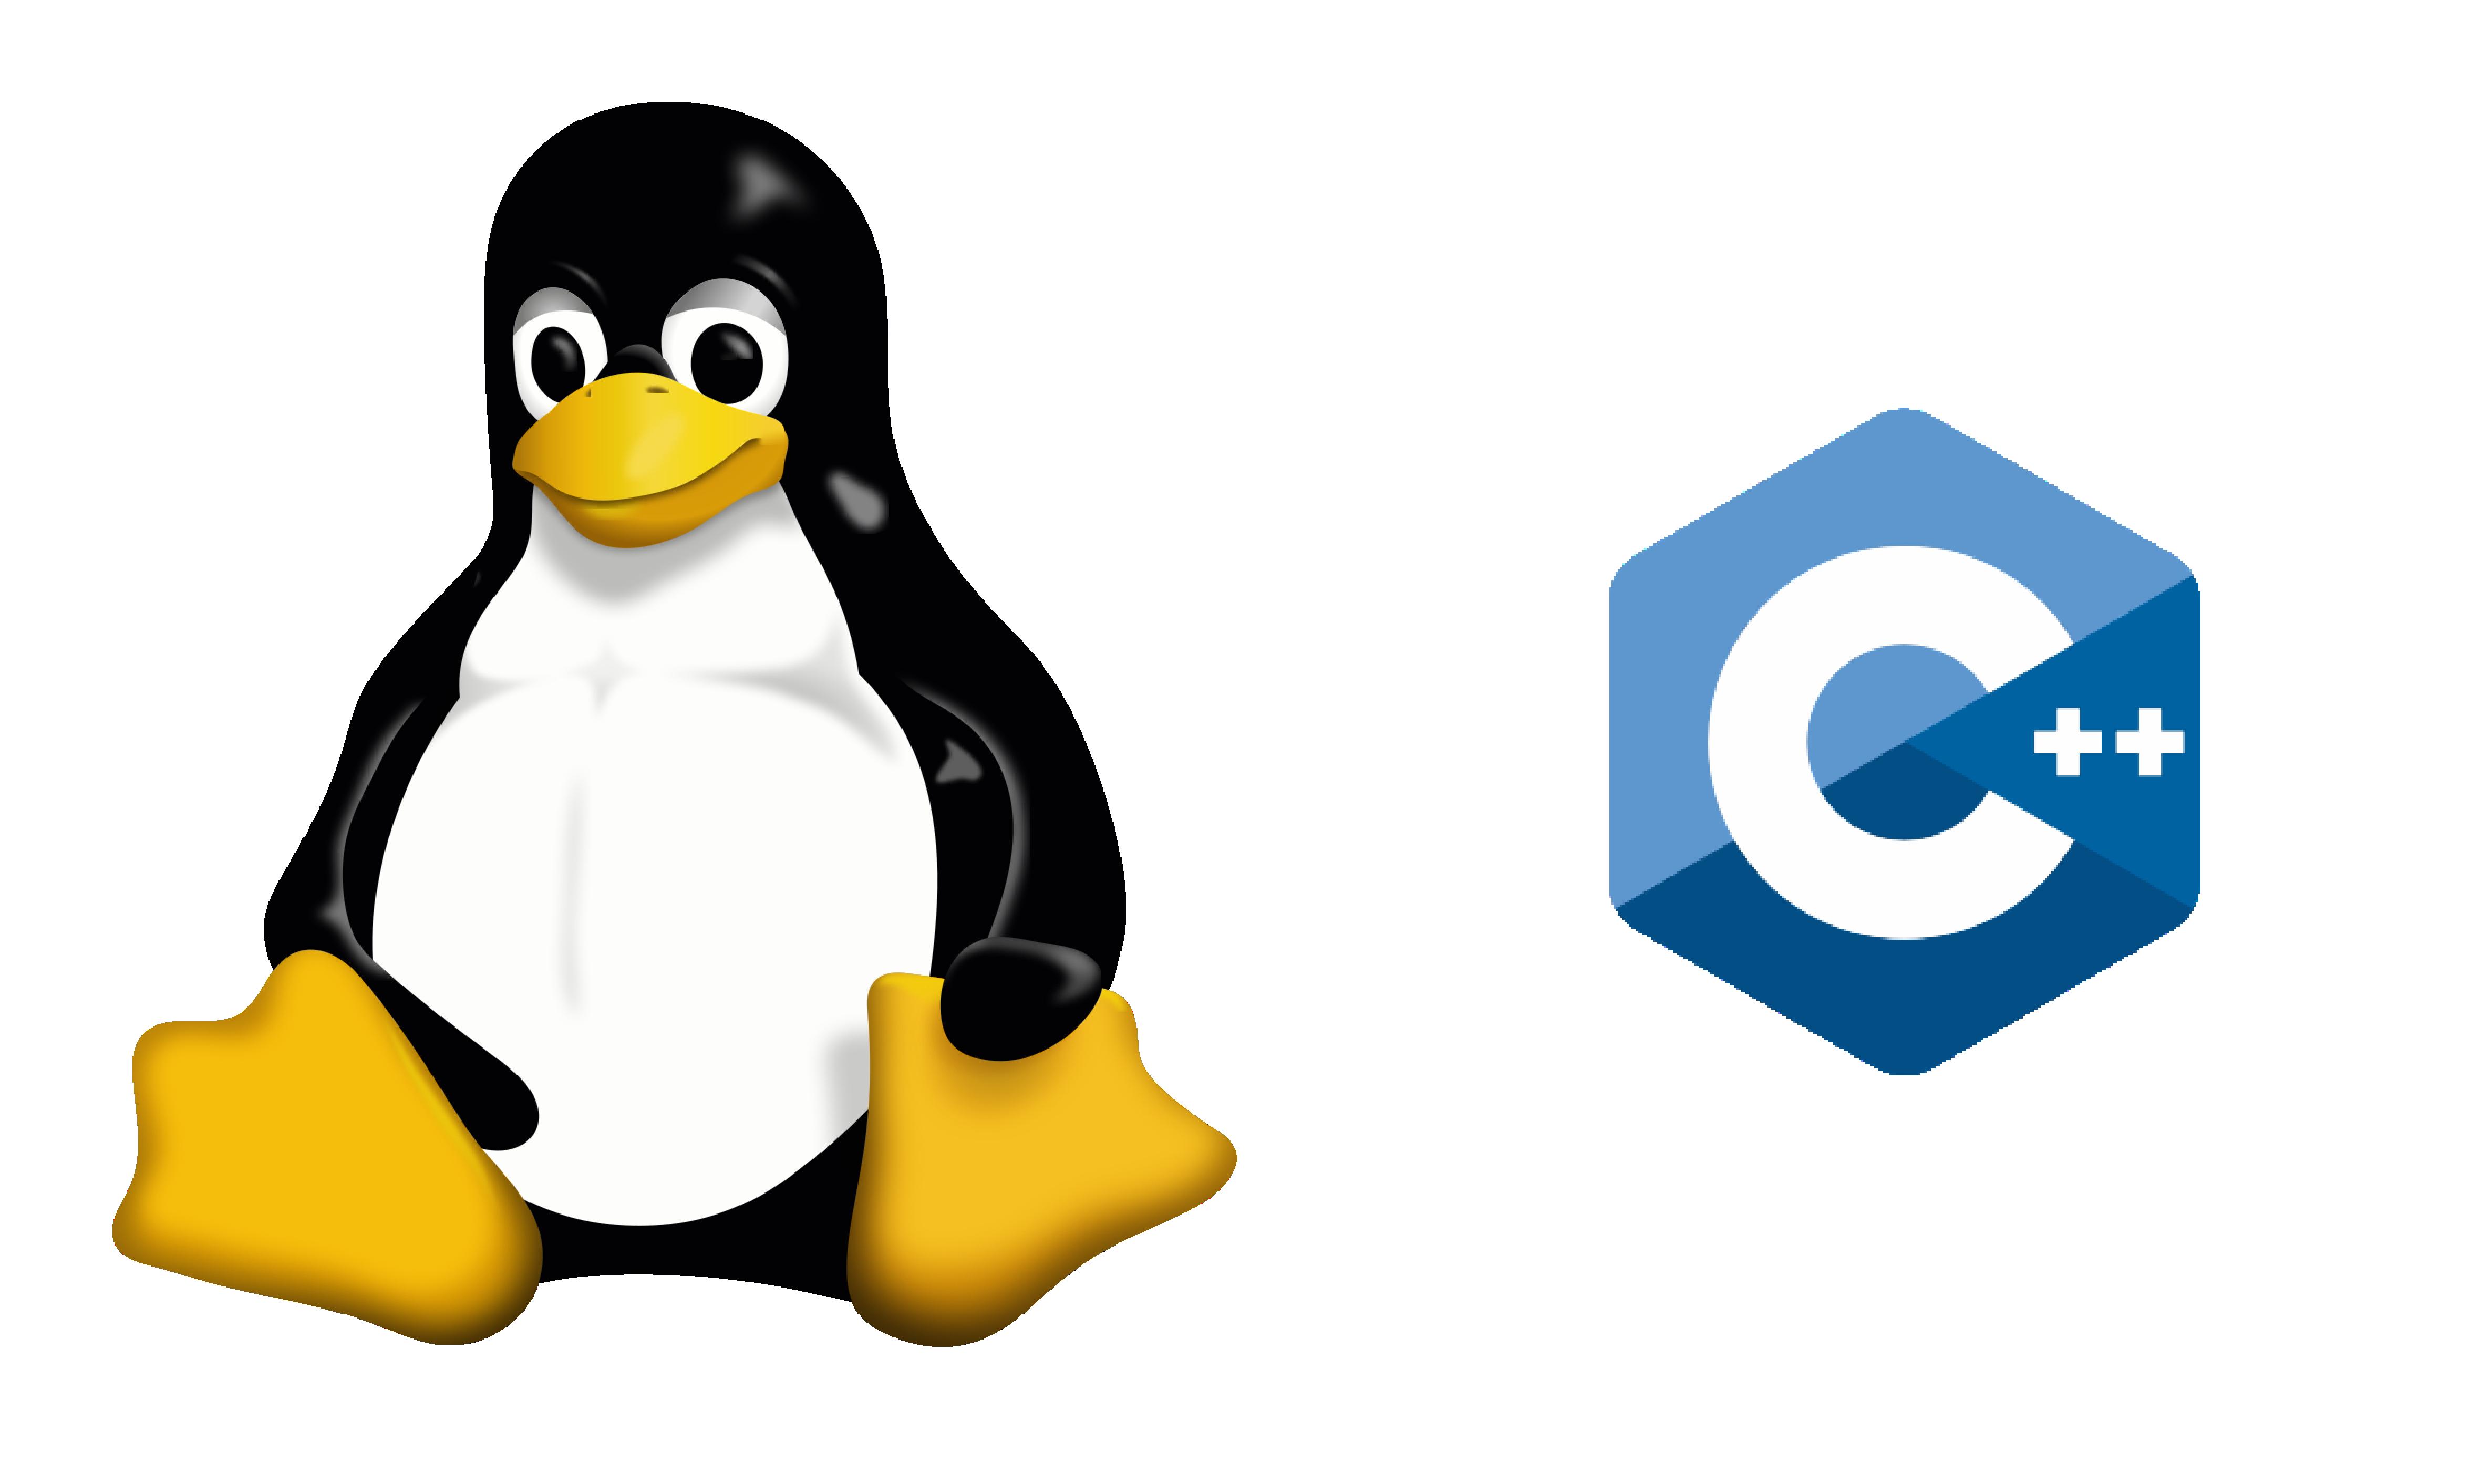 C++ Linux Developer